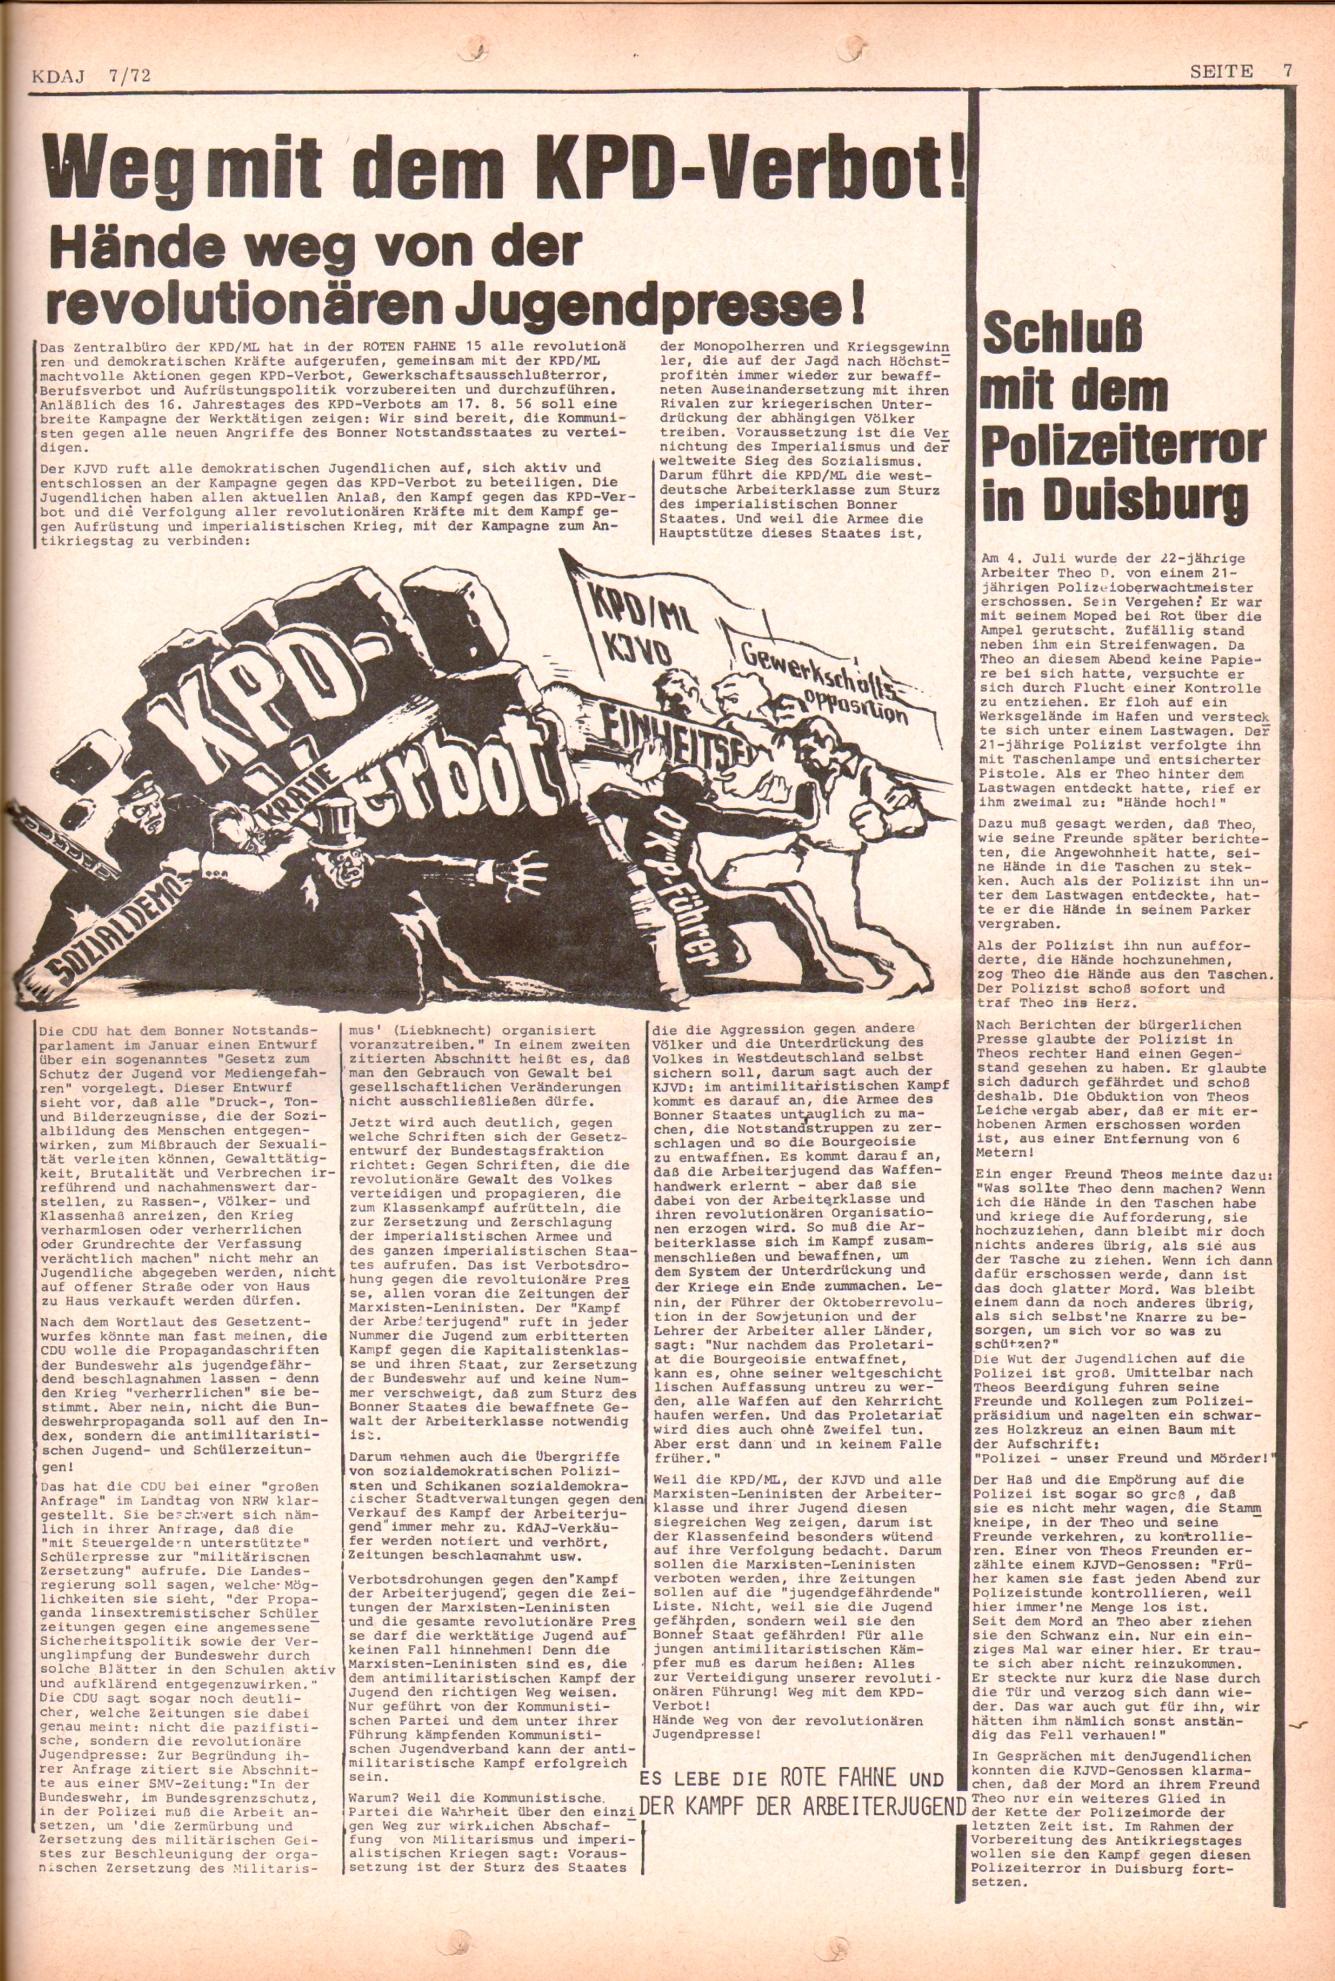 KDAJ, 3. Jg., August 1972, Nr. 7, Seite 7